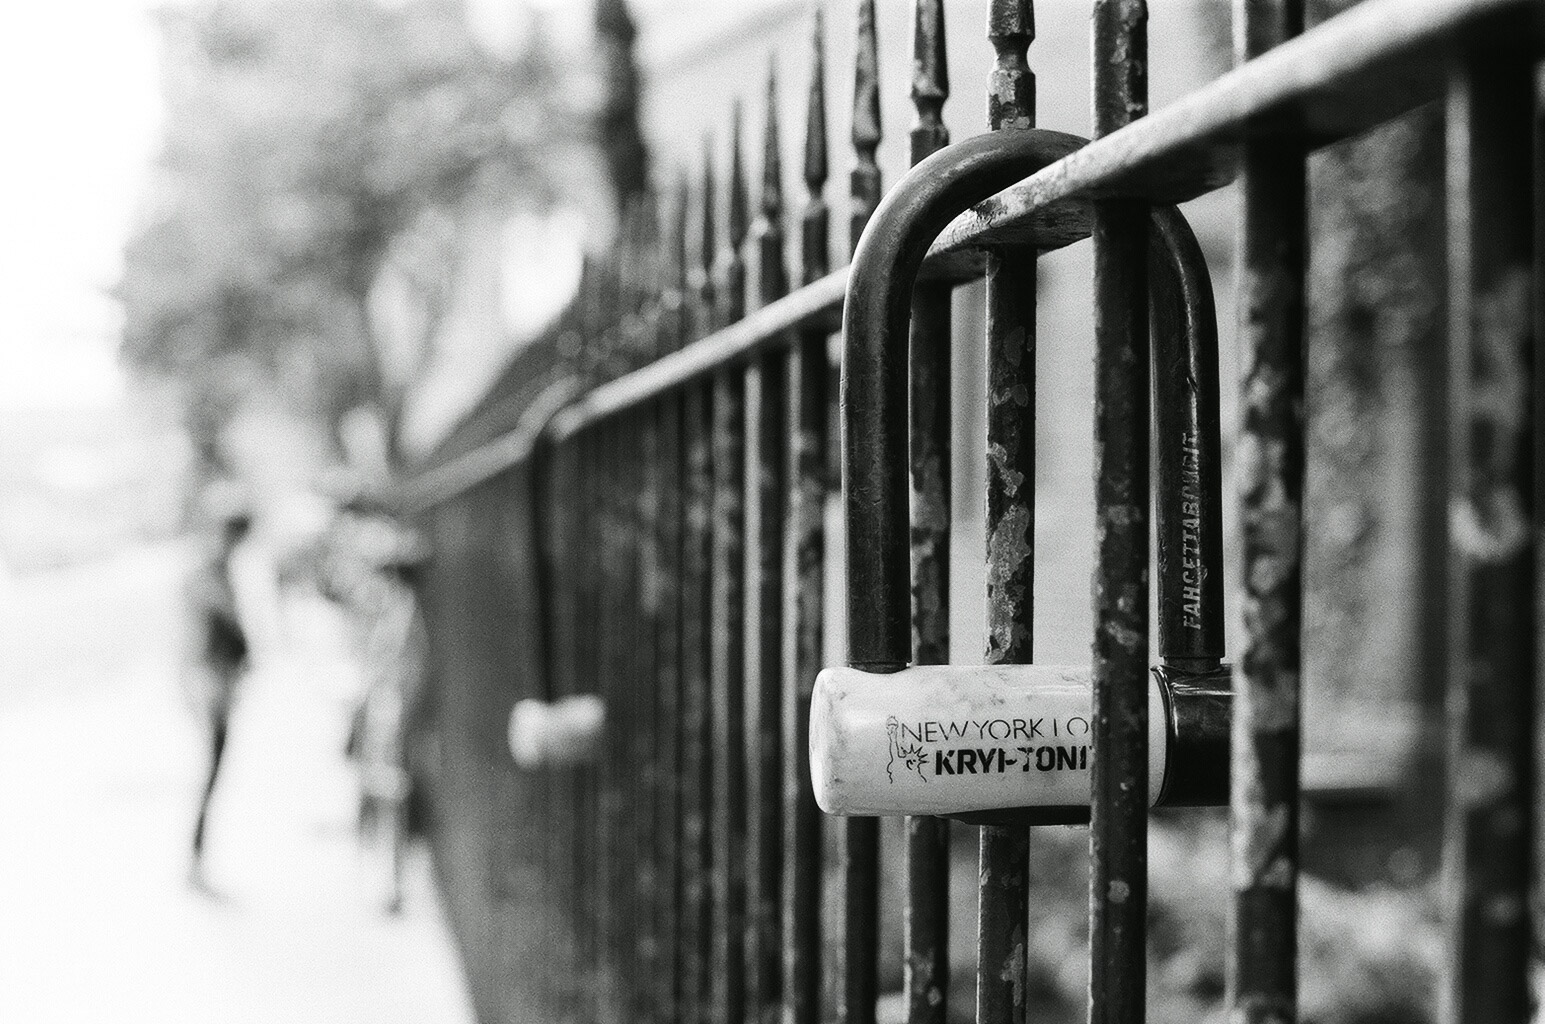 London - 5 Frames With... Kosmo Foto Mono 100 (EI 100 / 35mm format / Nikon F3/T) - by Lewis Day